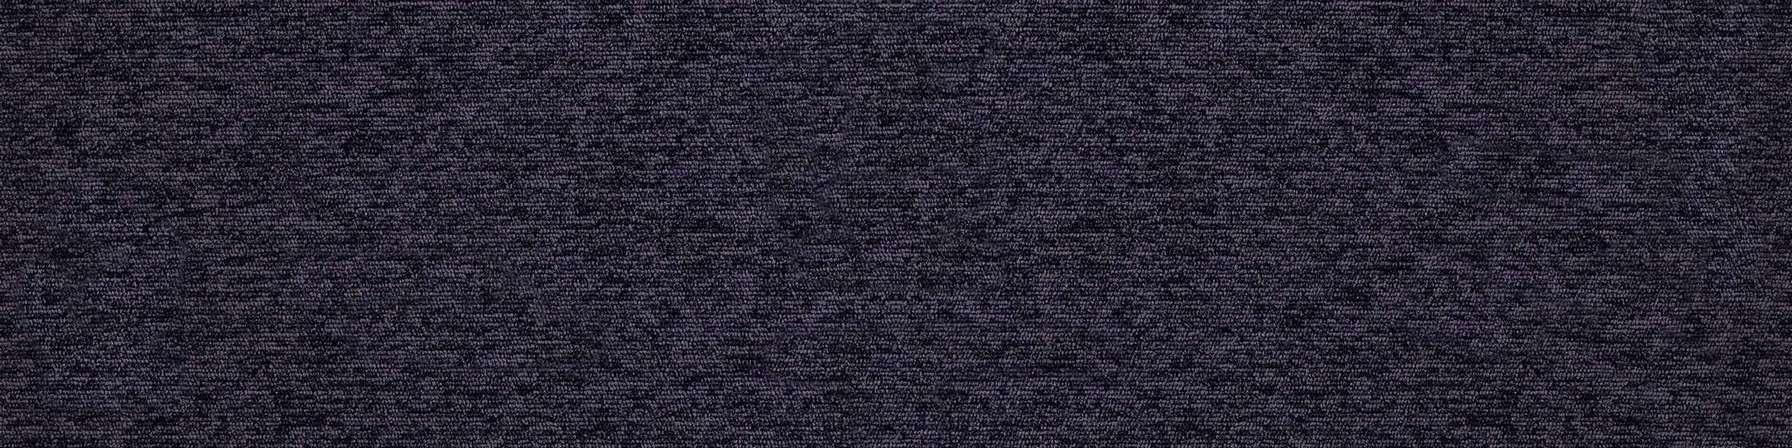 tivoli 21154 puerto rico purple carpet plank